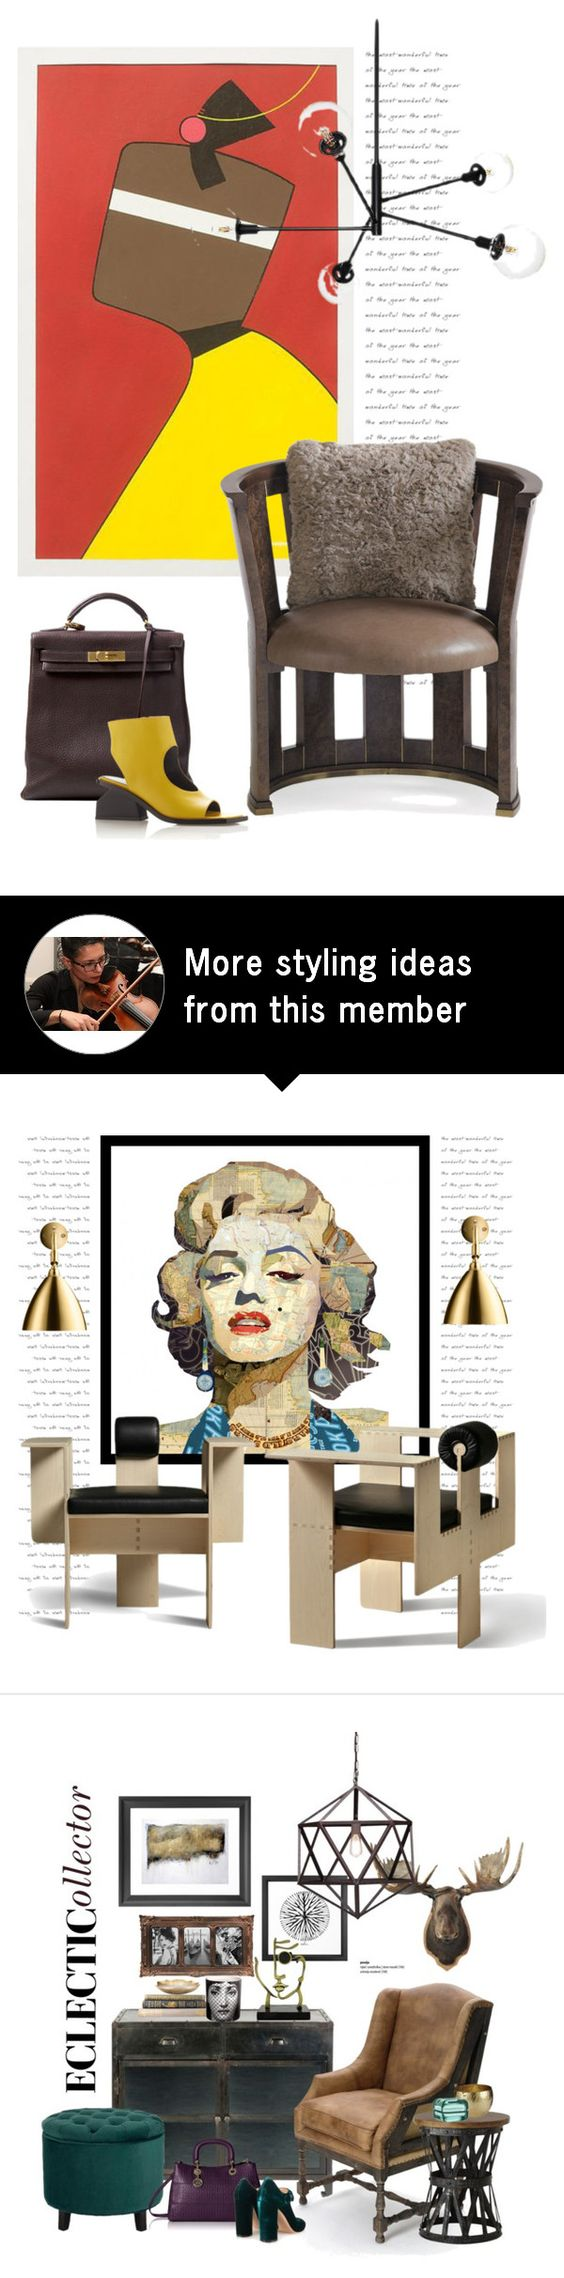 """Burl-Esque chair..."" by gloriettequartet on Polyvore featuring interior, interiors, interior design, home, home decor, interior decorating, NOVICA, Hermès and Marni"